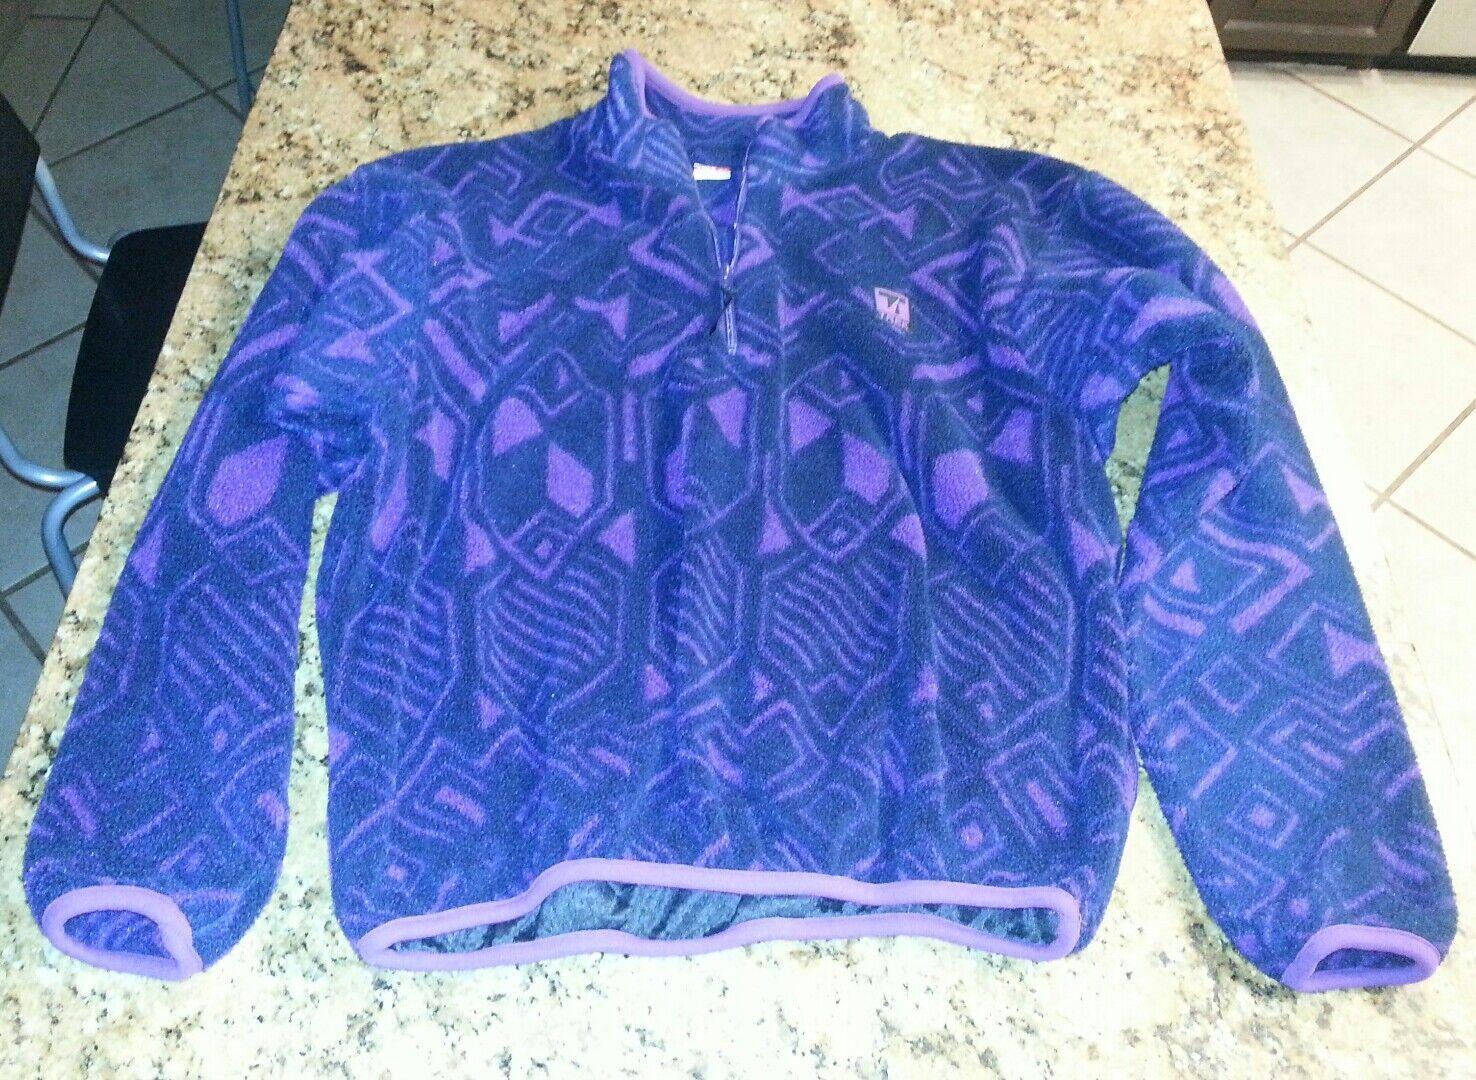 Vtg 90s Trek Syn lla Zip Fleece Shirt large lg  Aztec Print USA Cycling Jersey  sale online discount low price